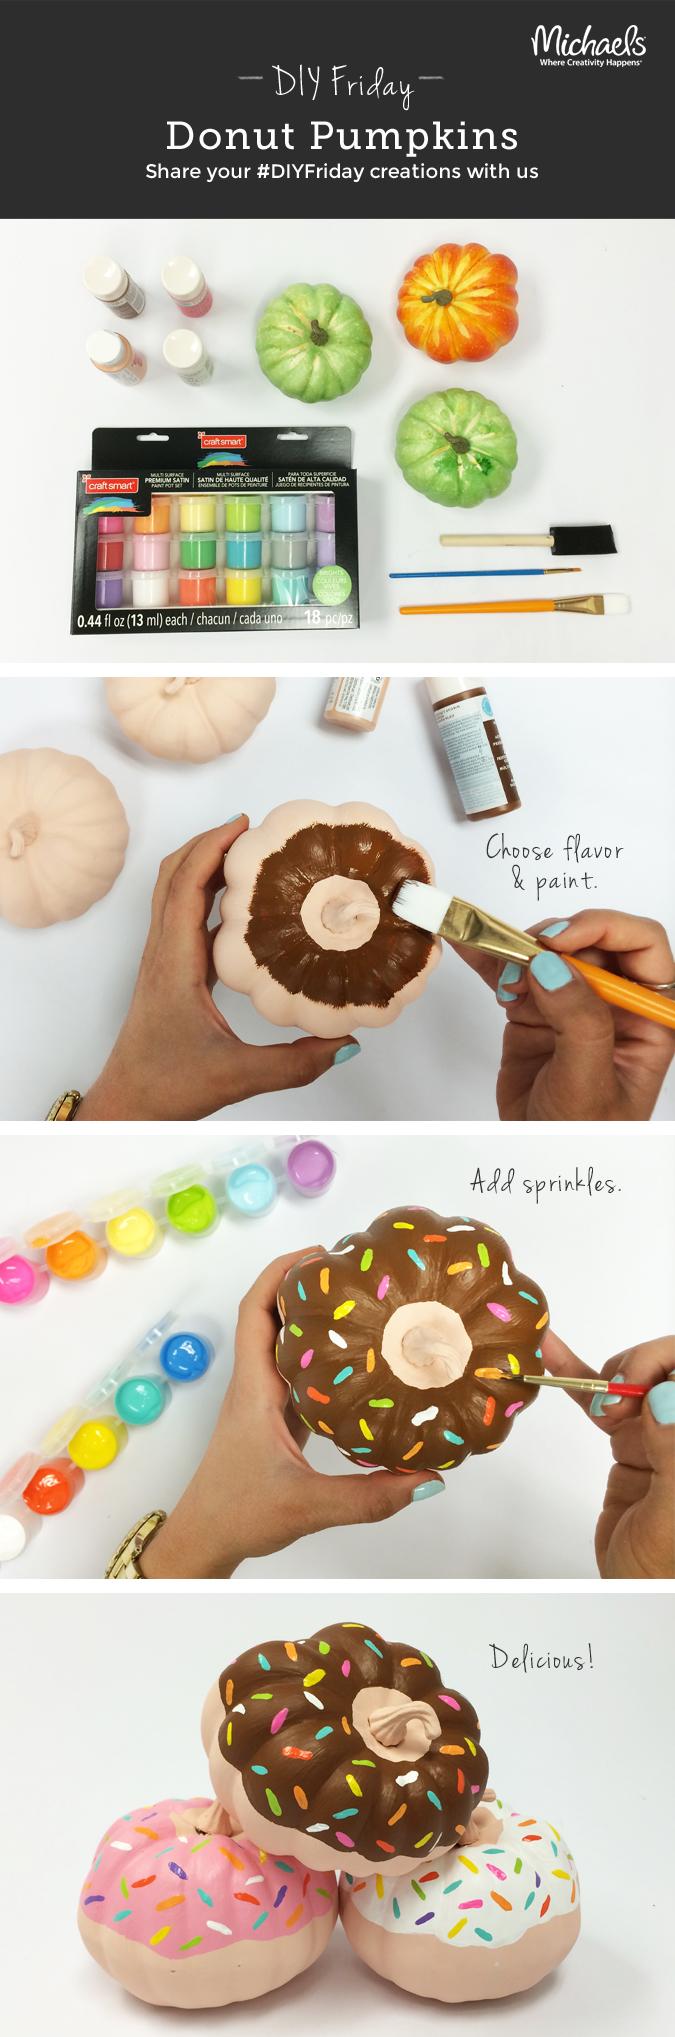 diy painted donut mini pumpkins crafting diy pinterest mini pumpkins donuts and minis. Black Bedroom Furniture Sets. Home Design Ideas